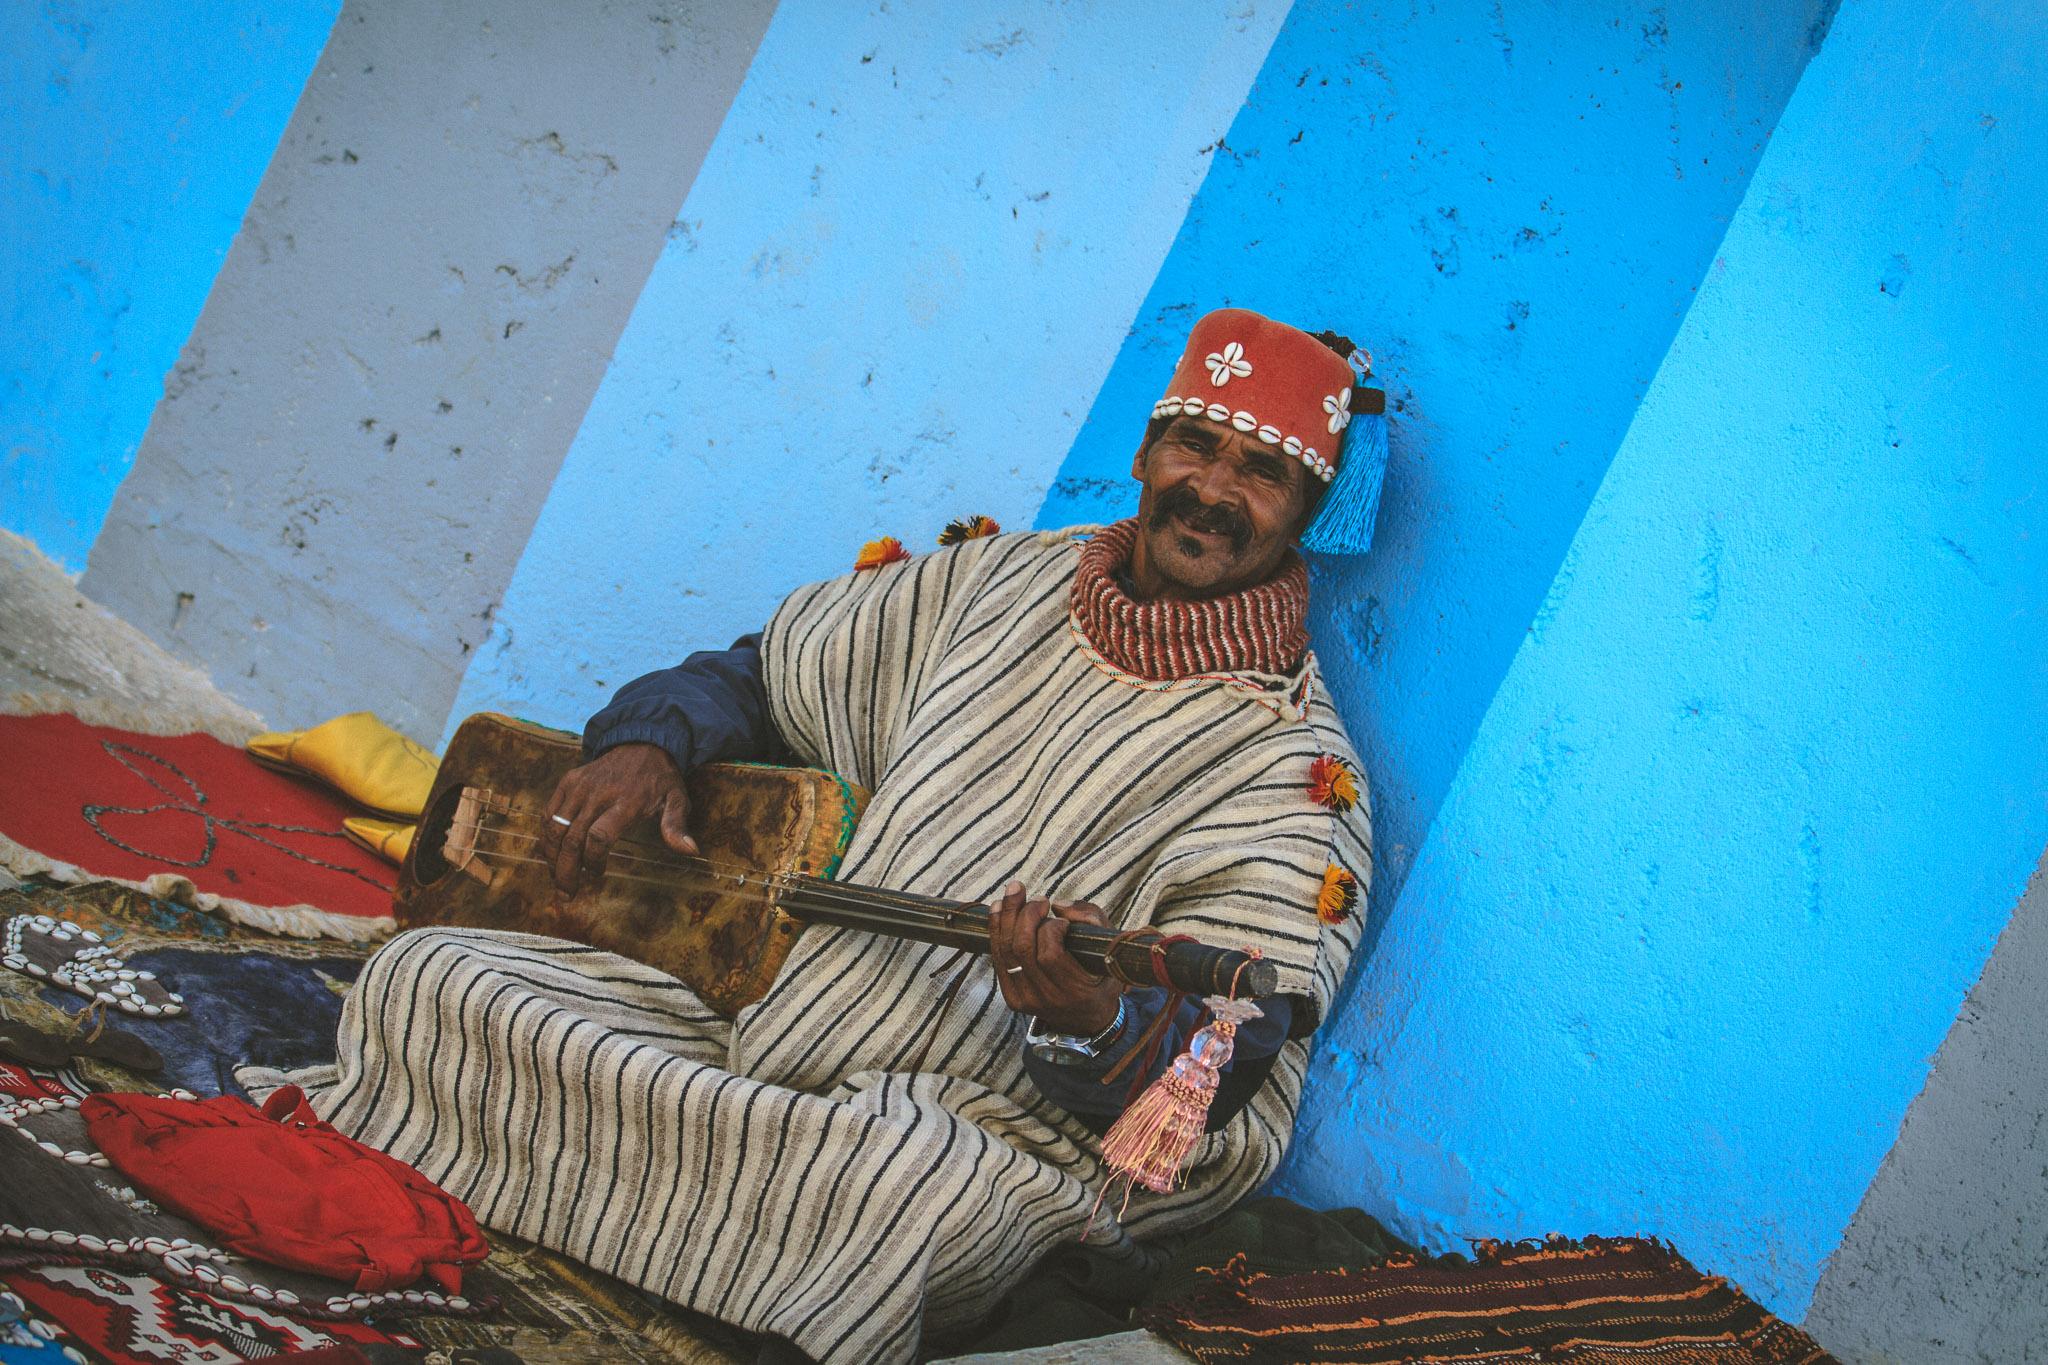 morocco_rabat_fez_casablanca_lesleyade_photography-12.jpg